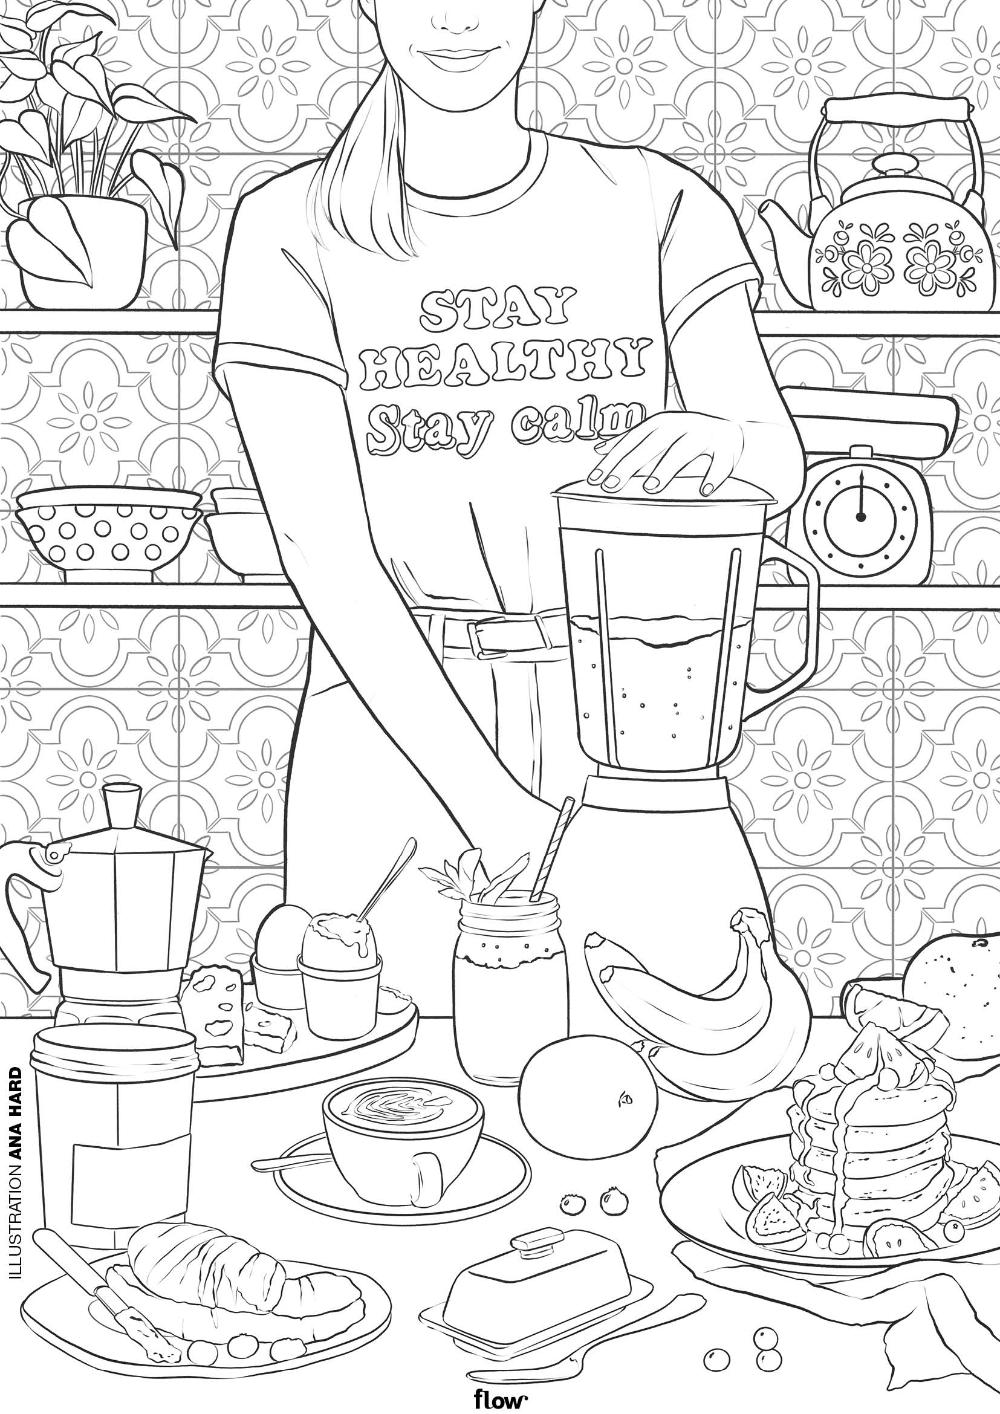 Kleurplaat Ana Hard Stay Healthy Calm Maak Een Smoothie Flow Magazine Nl Kleurplaten Kleurboek Mandala Kleurplaten